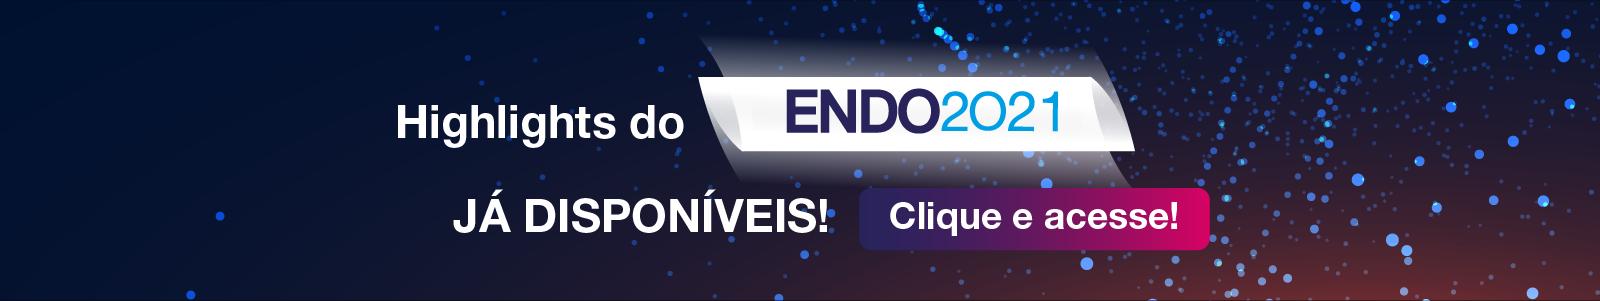 CE2021-banners-ENDO2021 cópia